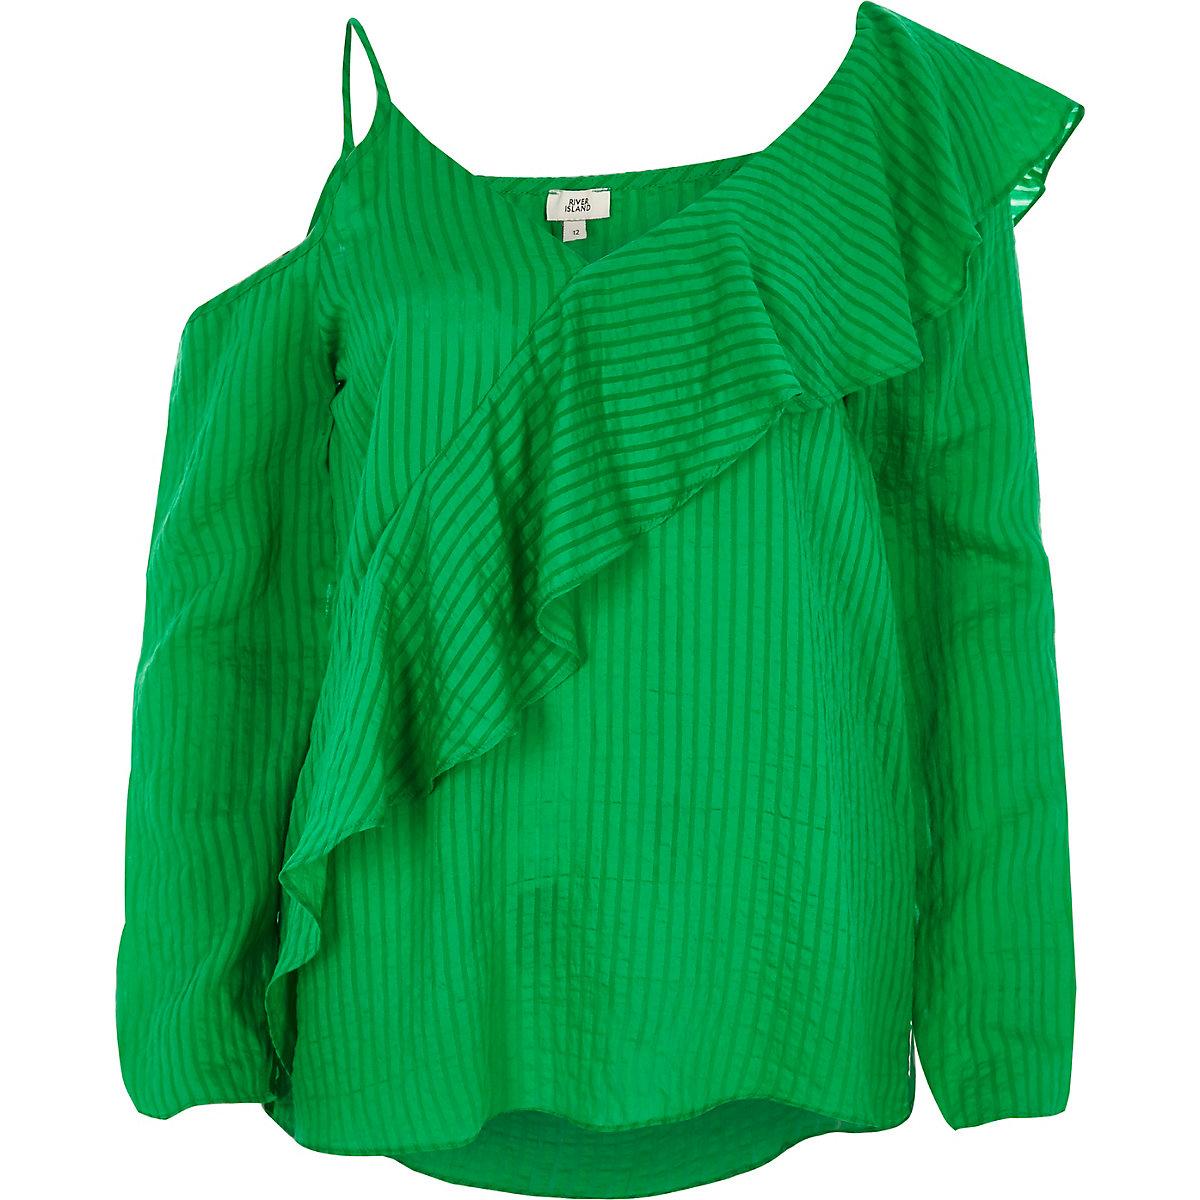 Green ribbed asymmetric bardot frill top